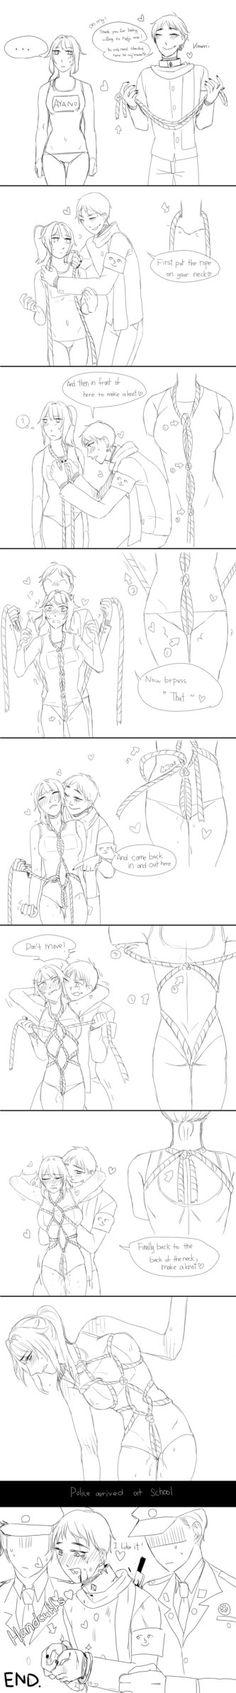 (Koumi x Ayano)Tasks for pervy club leader by Koumi-senpai